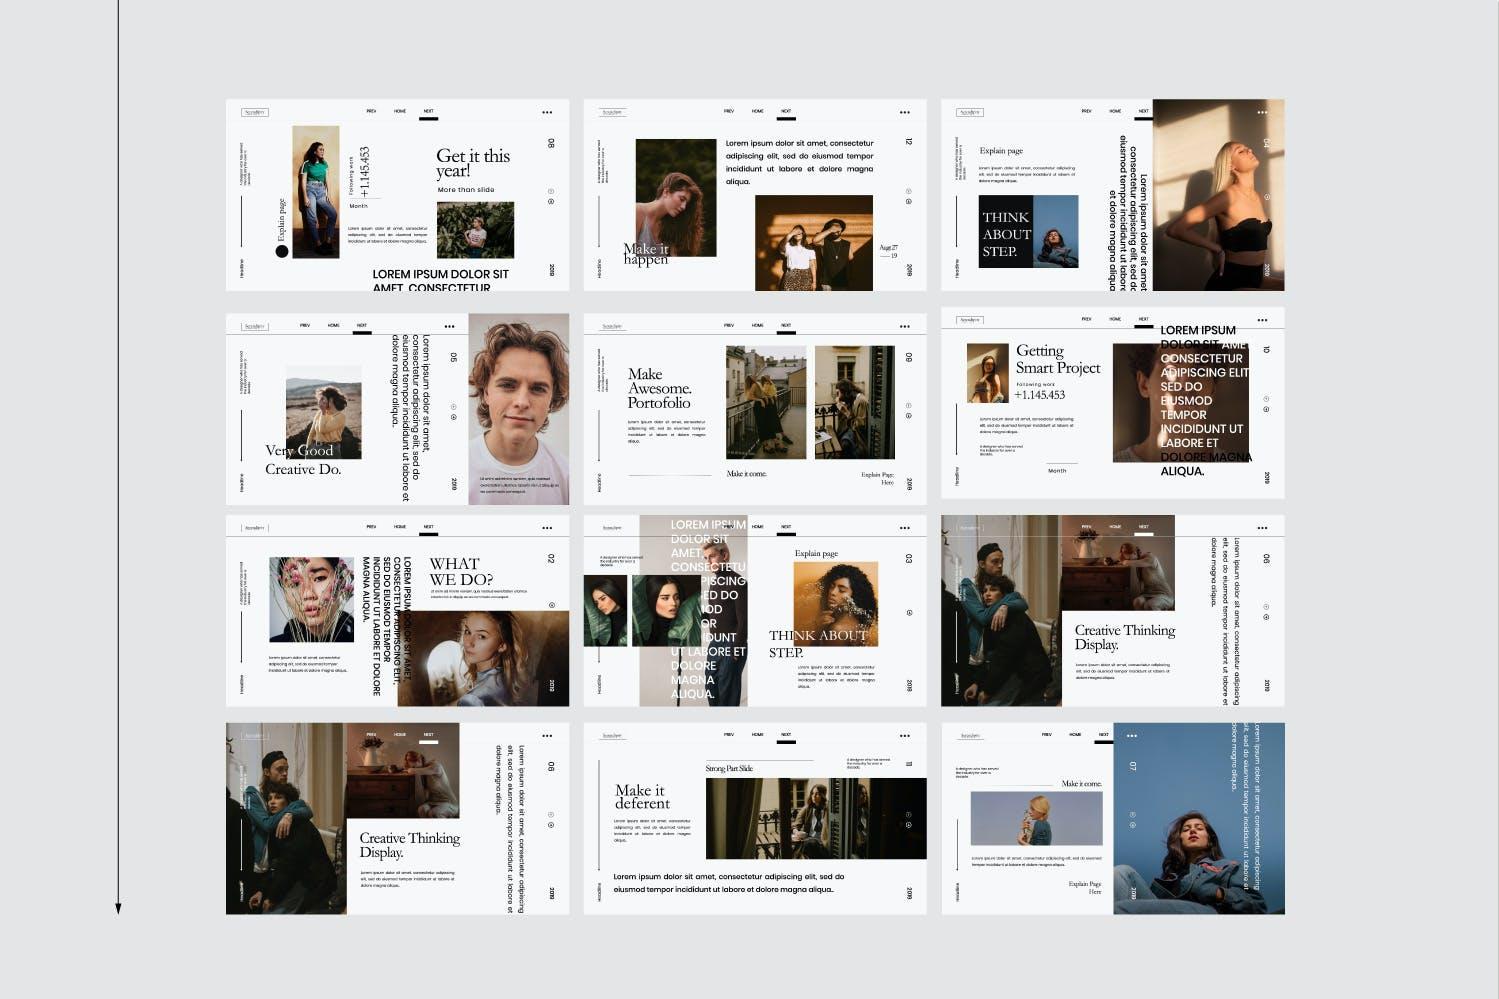 时尚简约服装摄影作品集幻灯片设计模板 Serendipity – Modern Fashion Design Powerpoint插图(10)